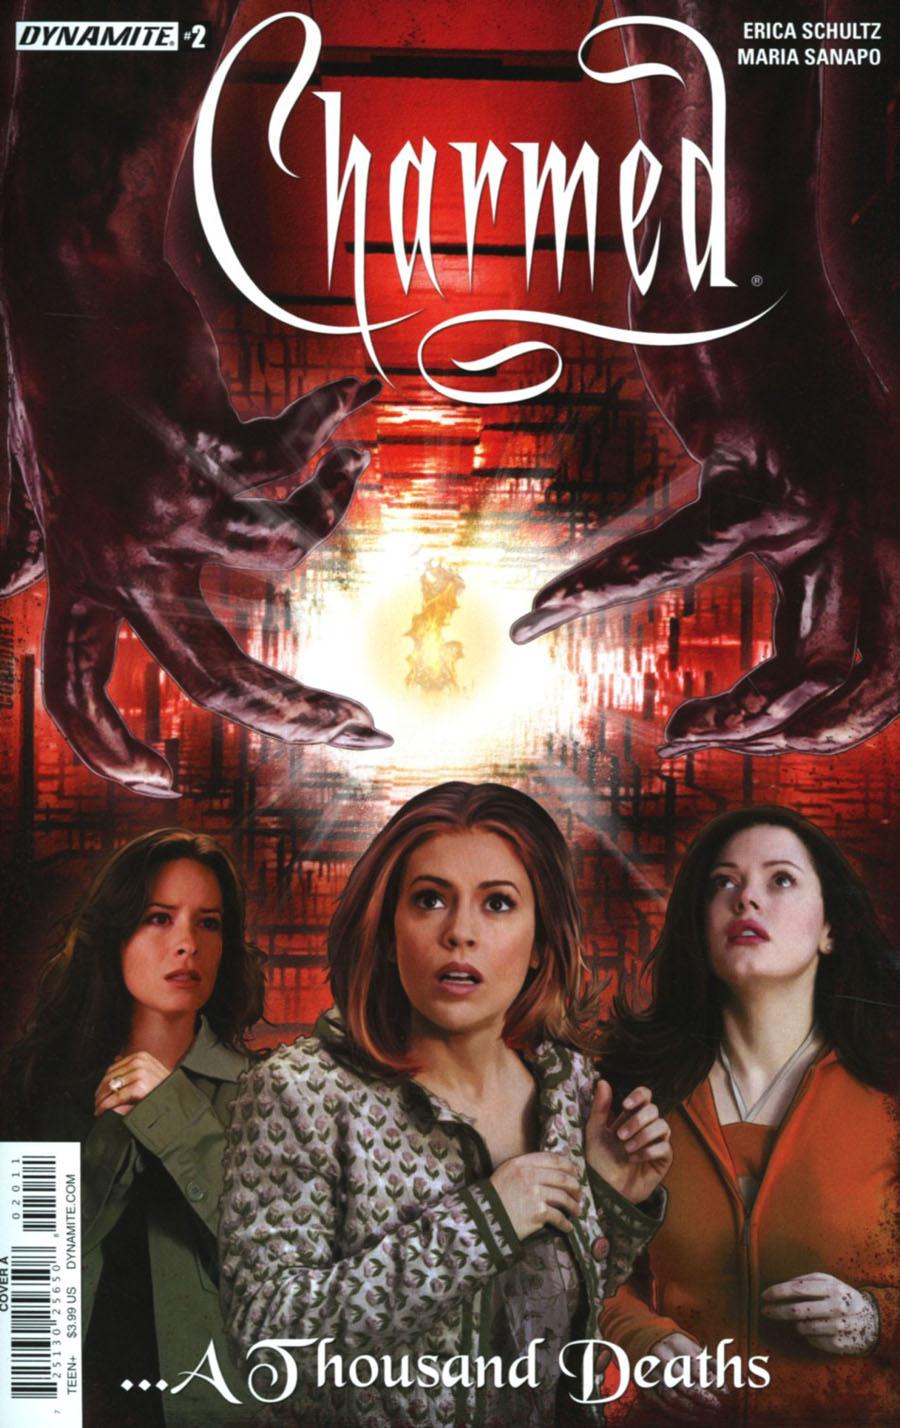 Charmed Vol 2 #2 Cover A Regular Joe Corroney Cover